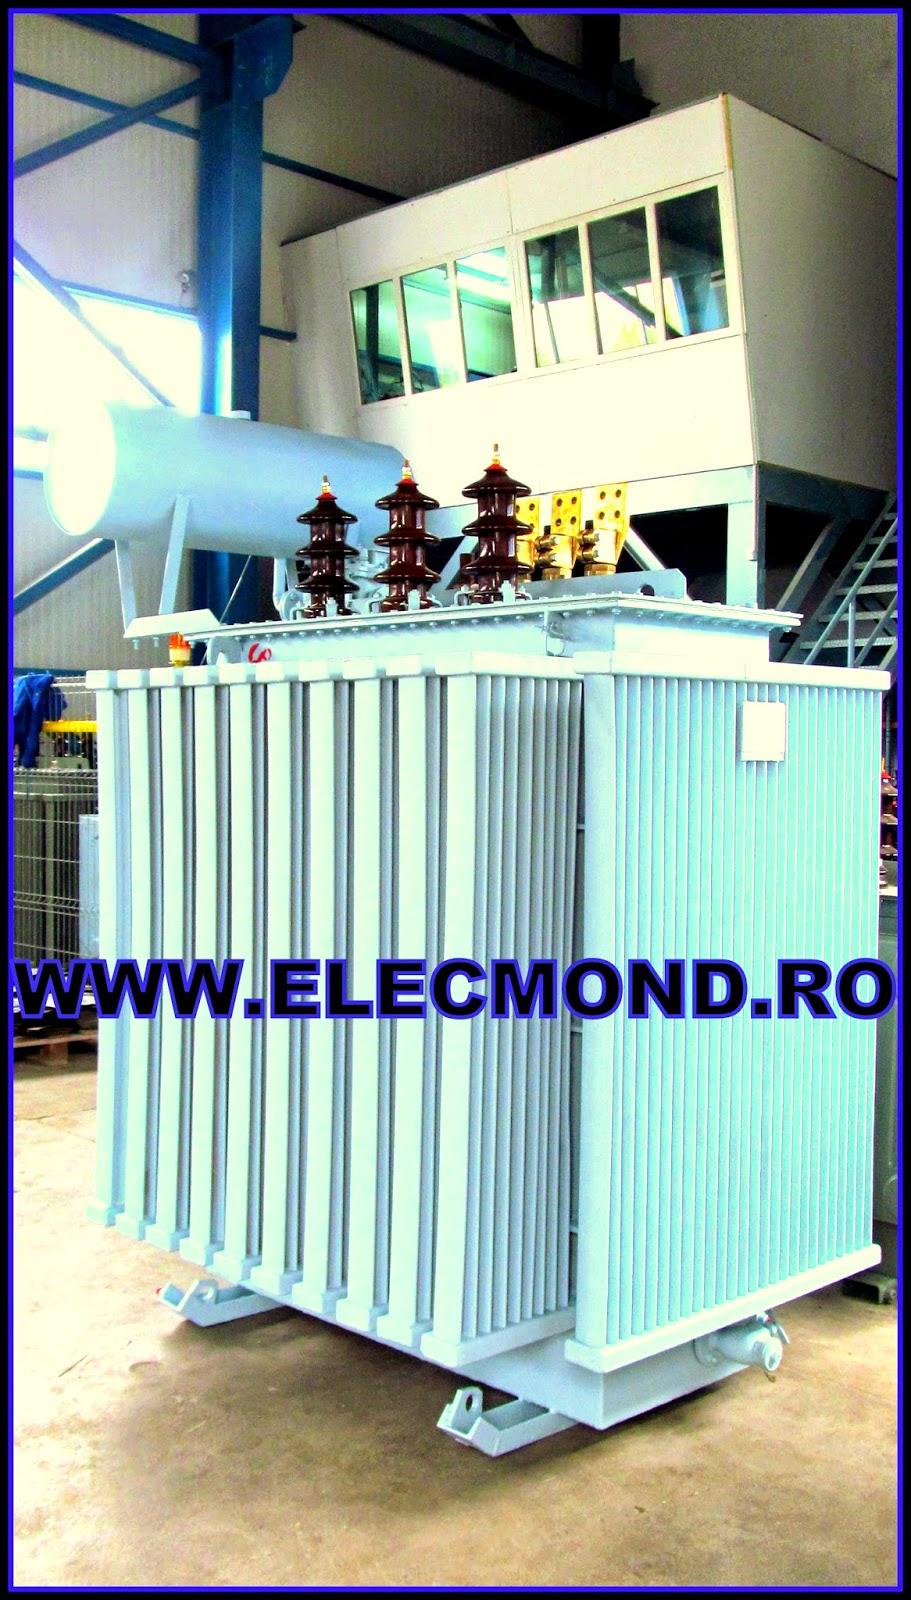 TRANSFORMATOARE 2000 kVA , transformator 2000 kVA  , transformator 2 MVA , trafo 2000 kVA 20/0,66kV , transformatoare preturi  elecmond blog , elecmond